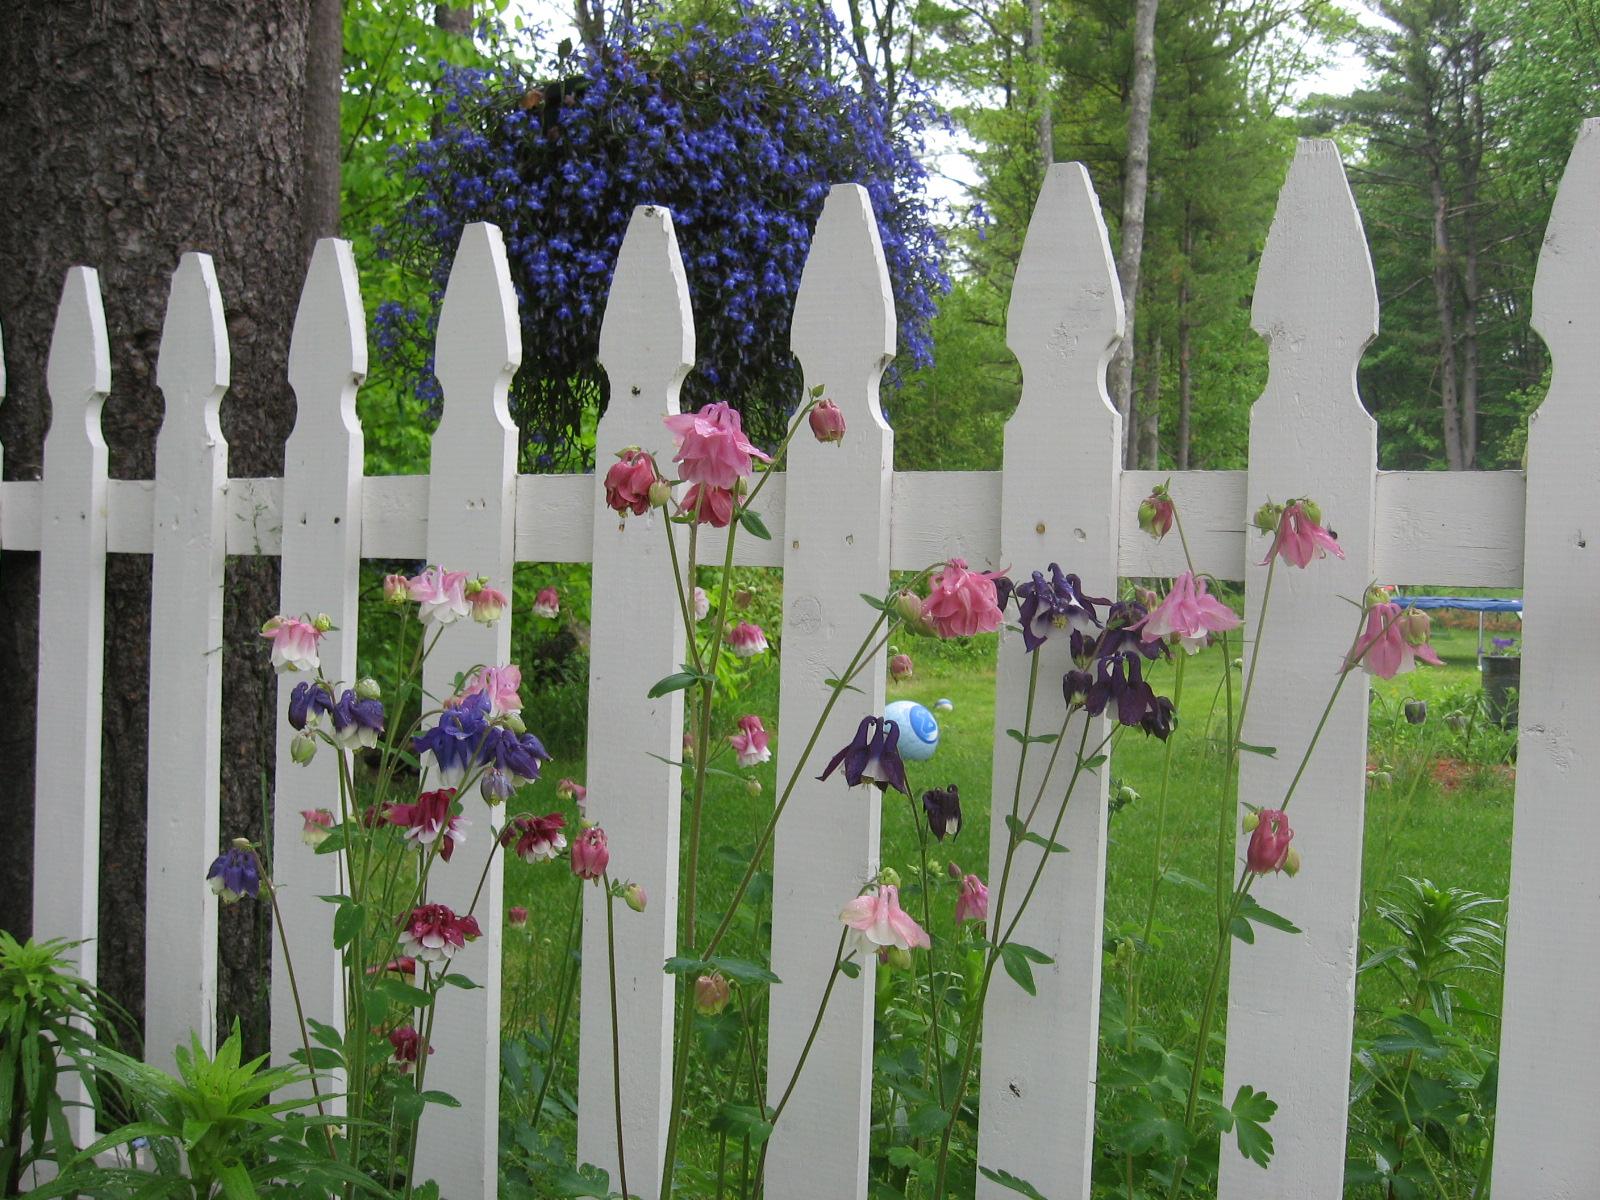 The garden of eden new england today - Where is the garden of eden today ...